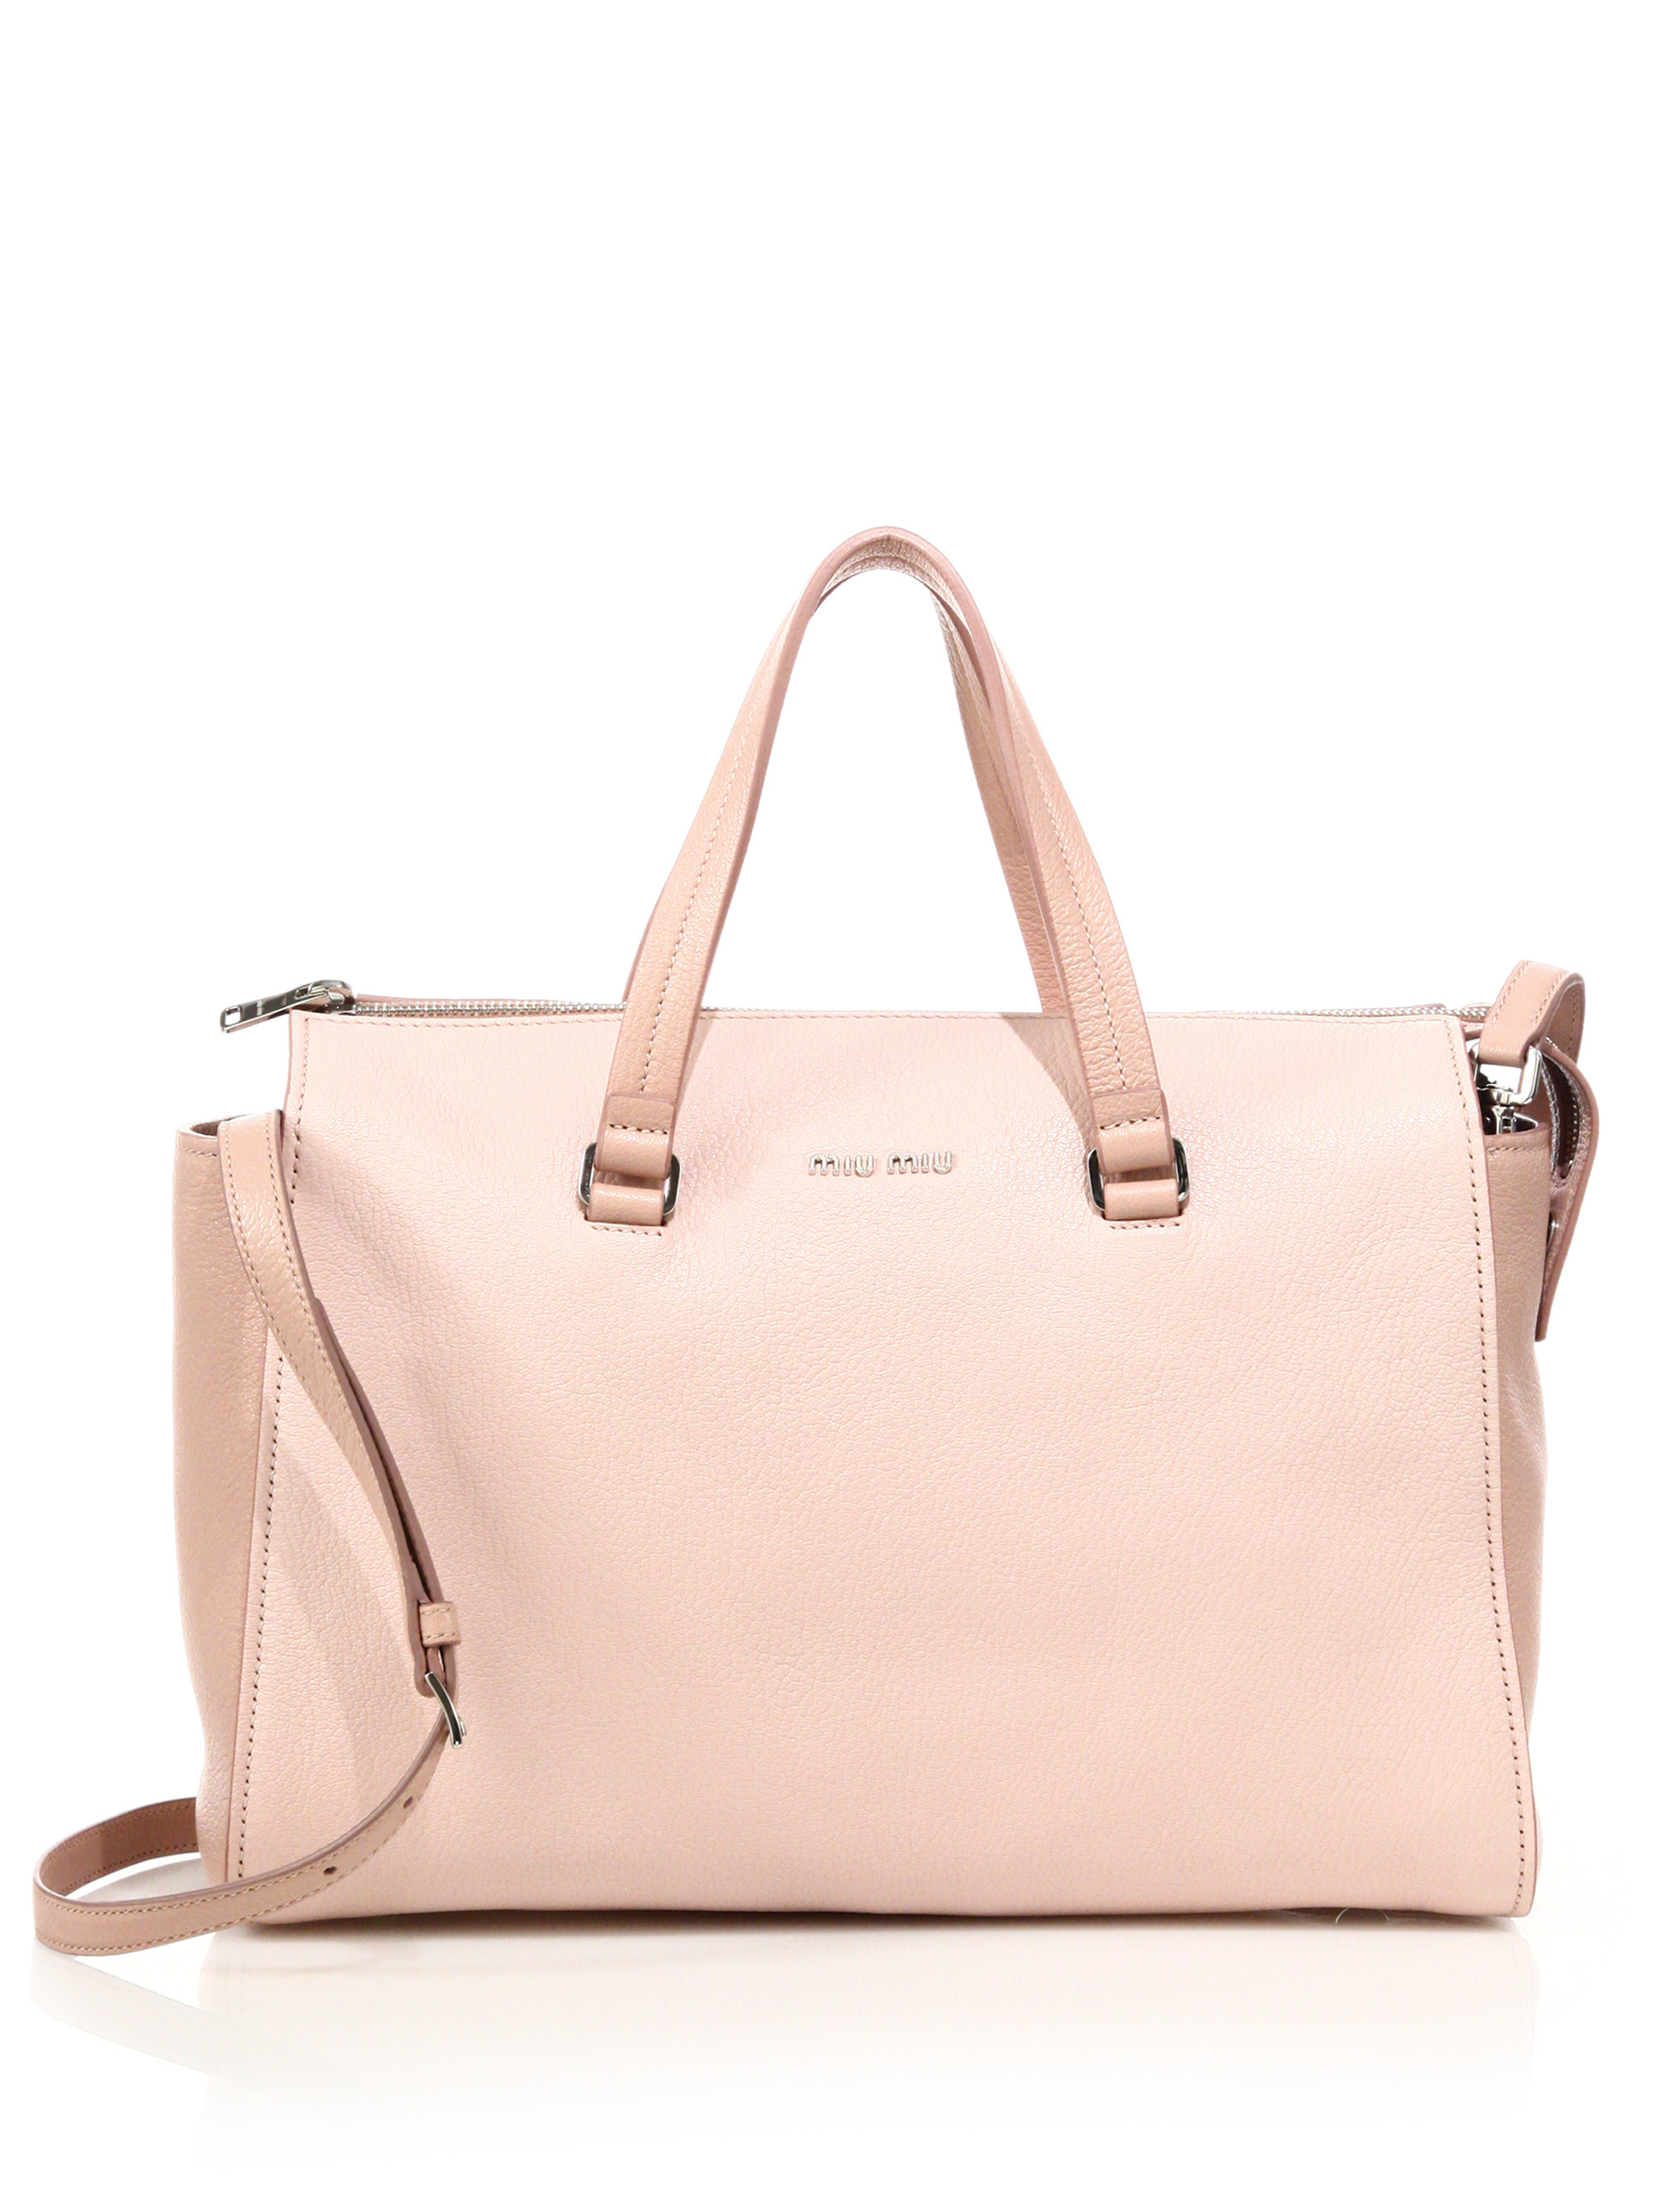 Lyst - Miu Miu Madras Two-tone Leather Zip Satchel in Pink ead7283baf133